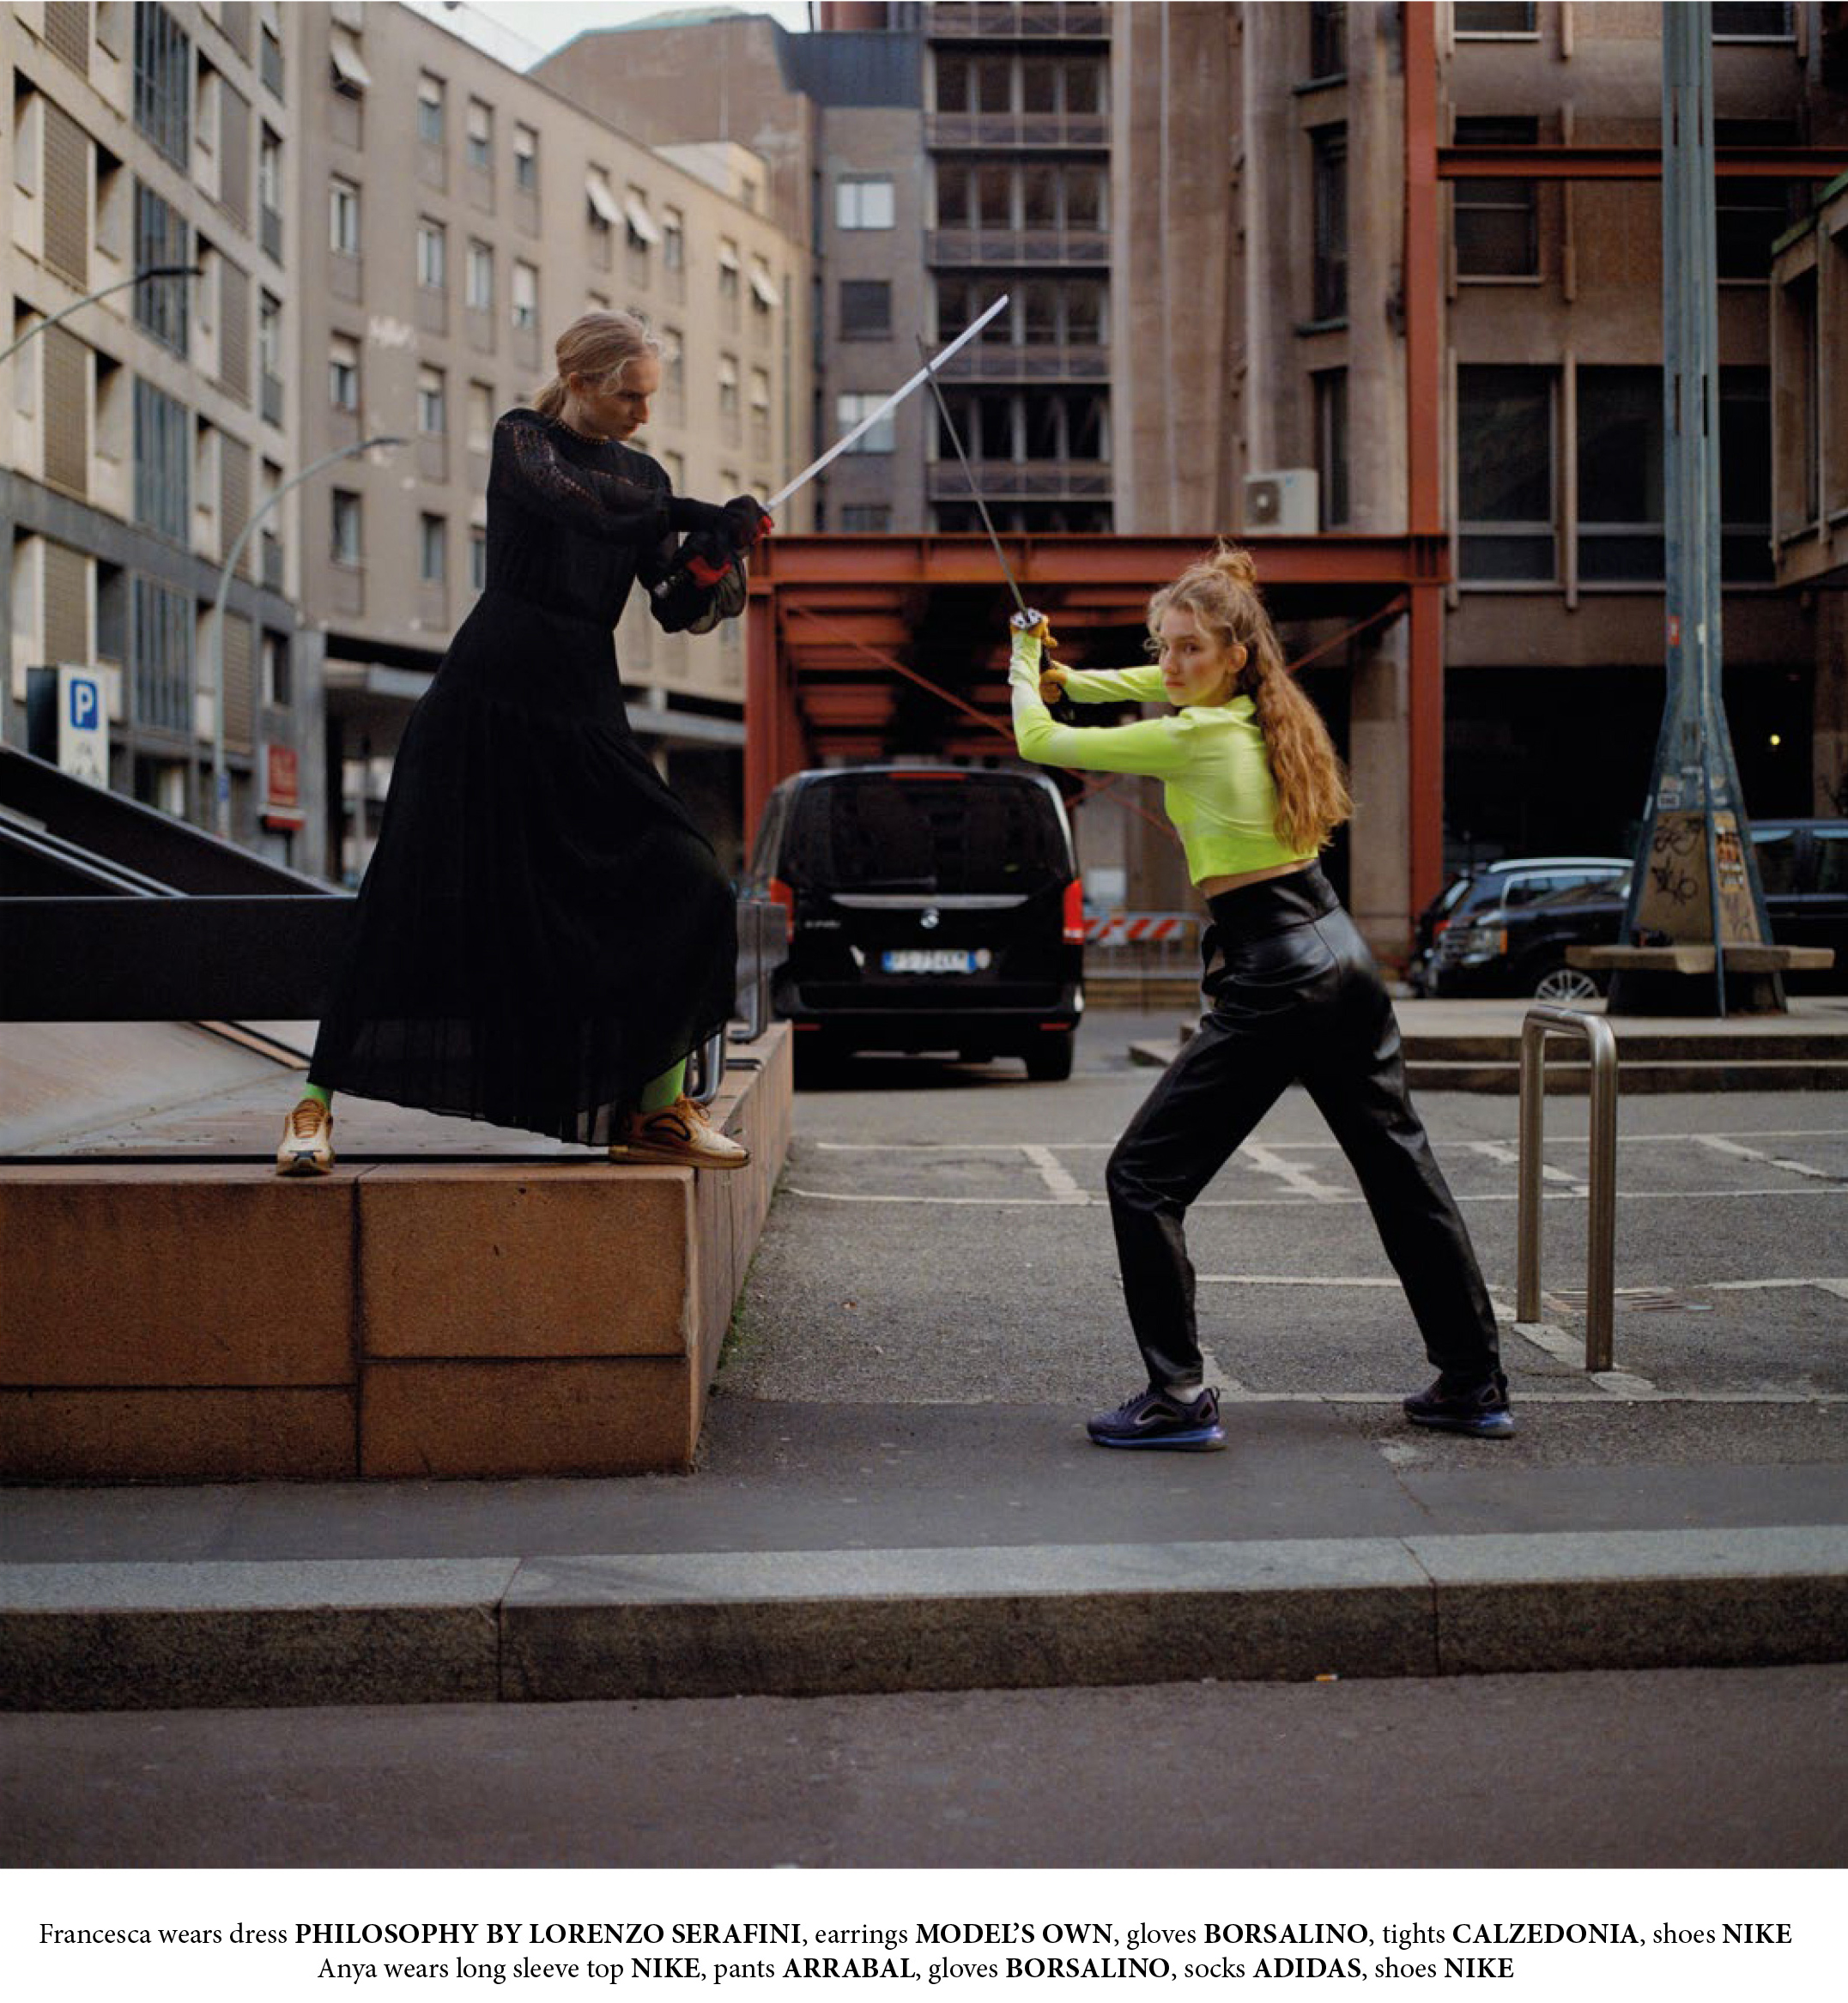 WRPD MAGAZINE   - HIGHLANDER IN TOWN   Photography by Gosha Pavlenko / Style by Nasty Shershen / Make-up by Sara Busan / Hair by Manuel Sunda